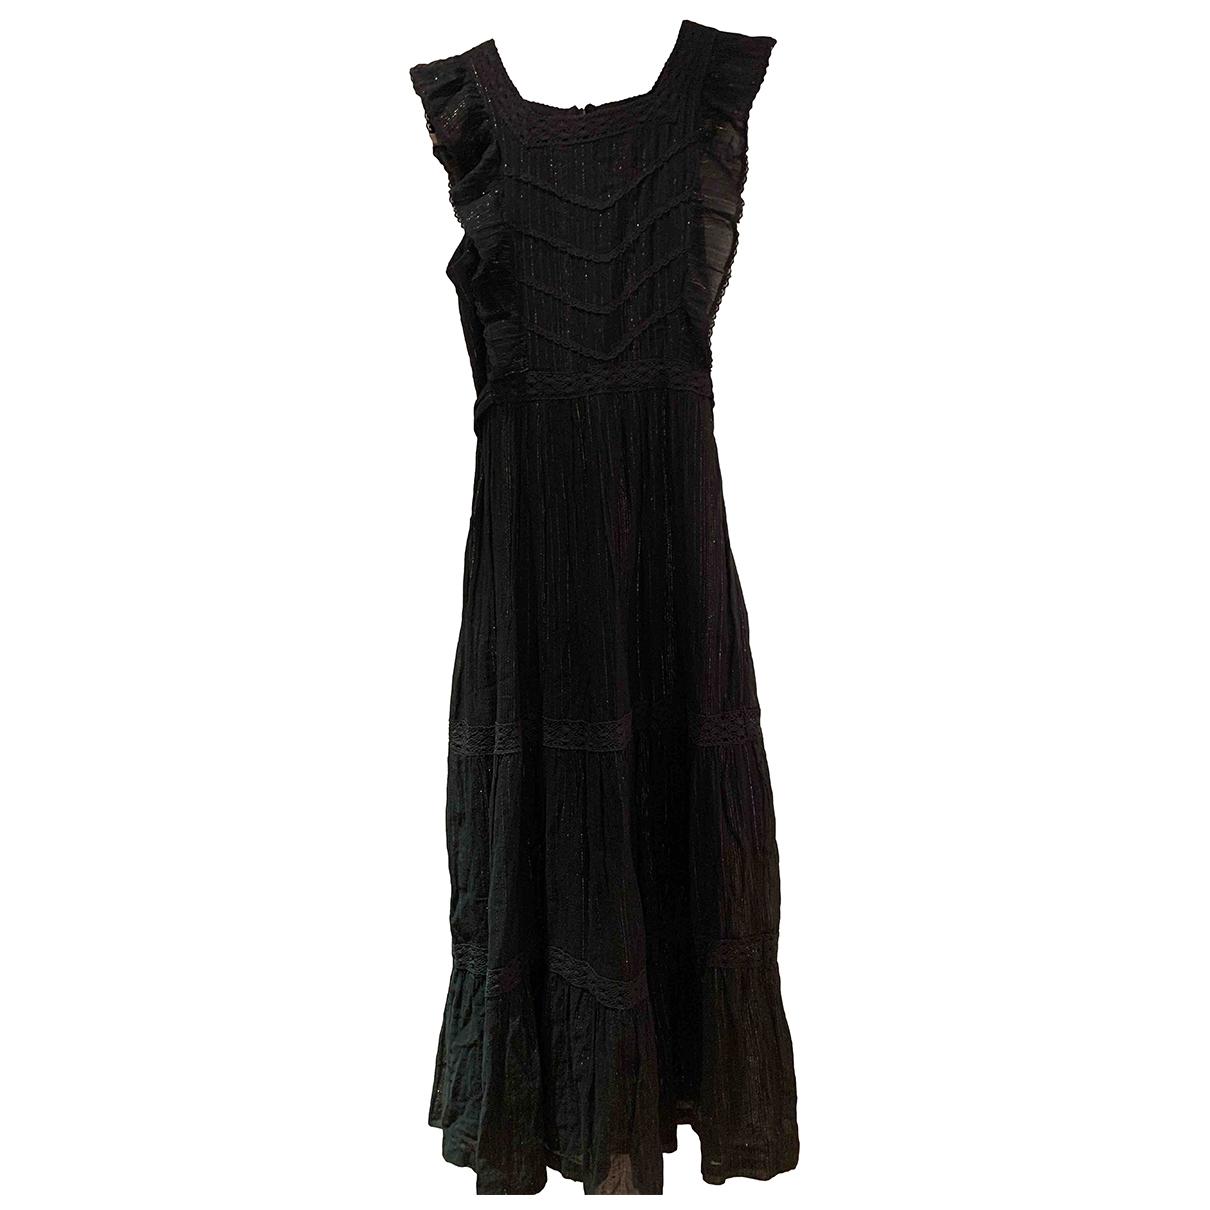 Soeur \N Black Cotton dress for Women 34 FR